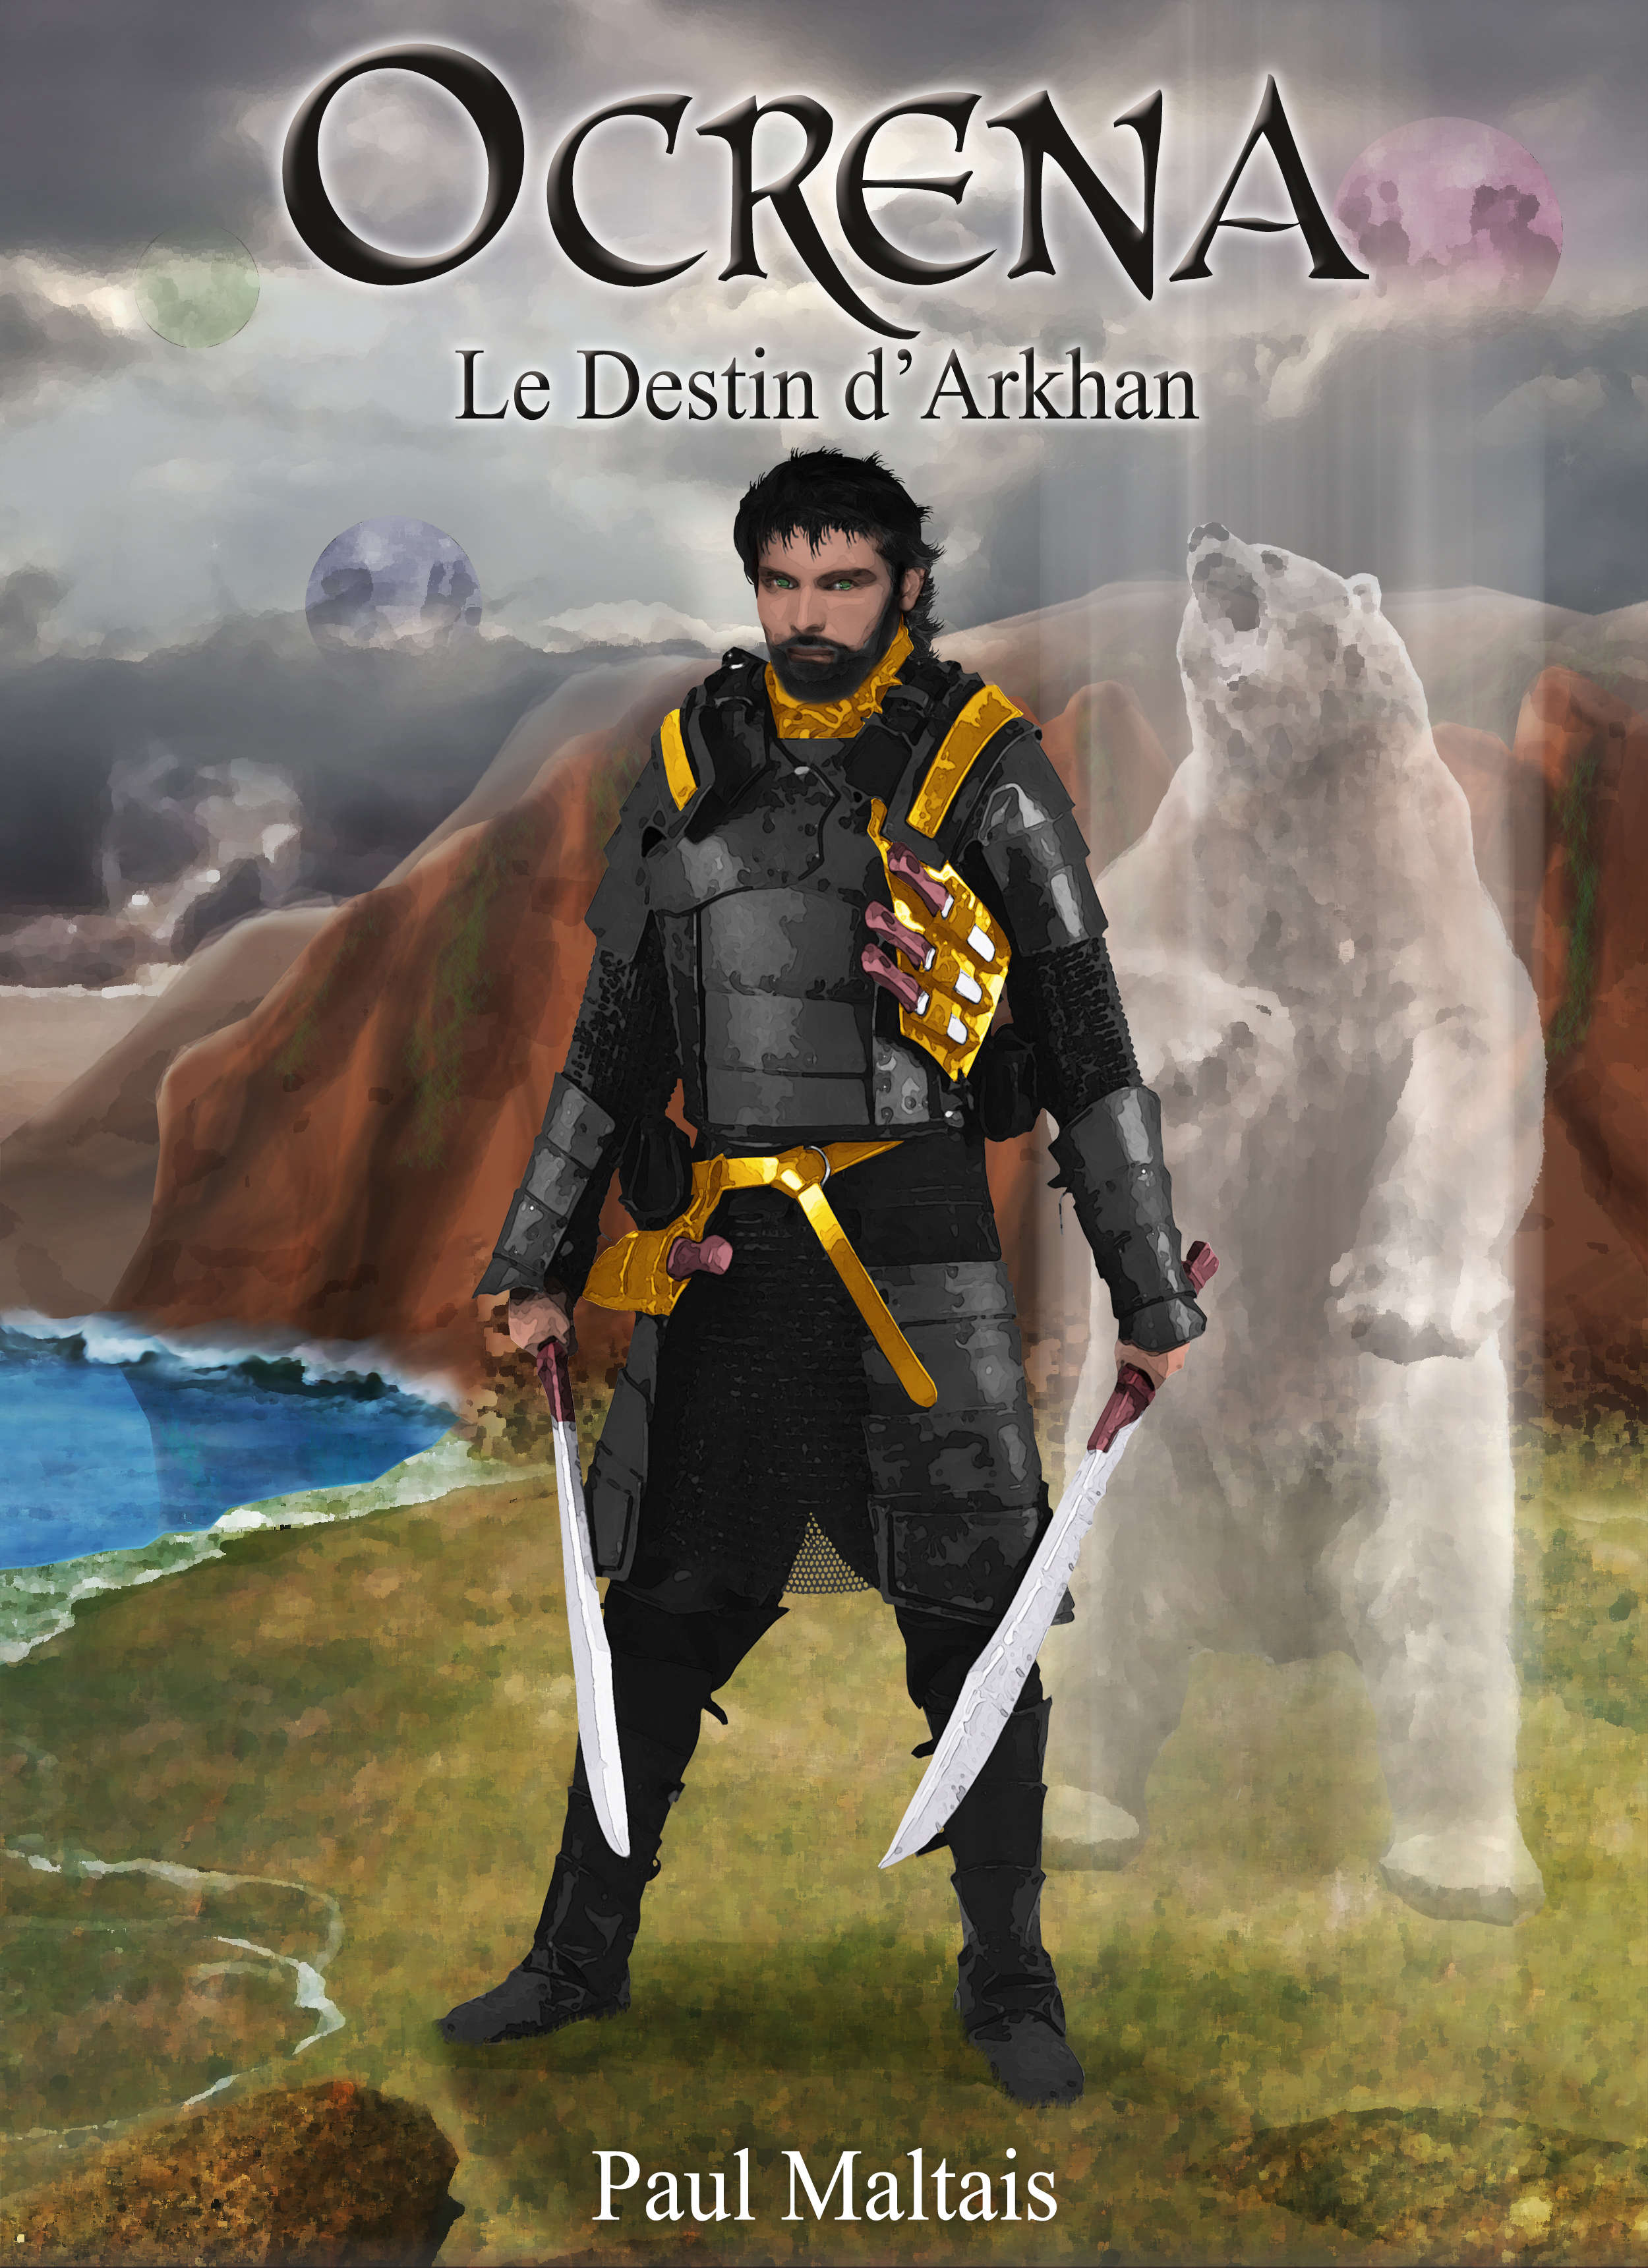 livre heroic fantasy Ocrena